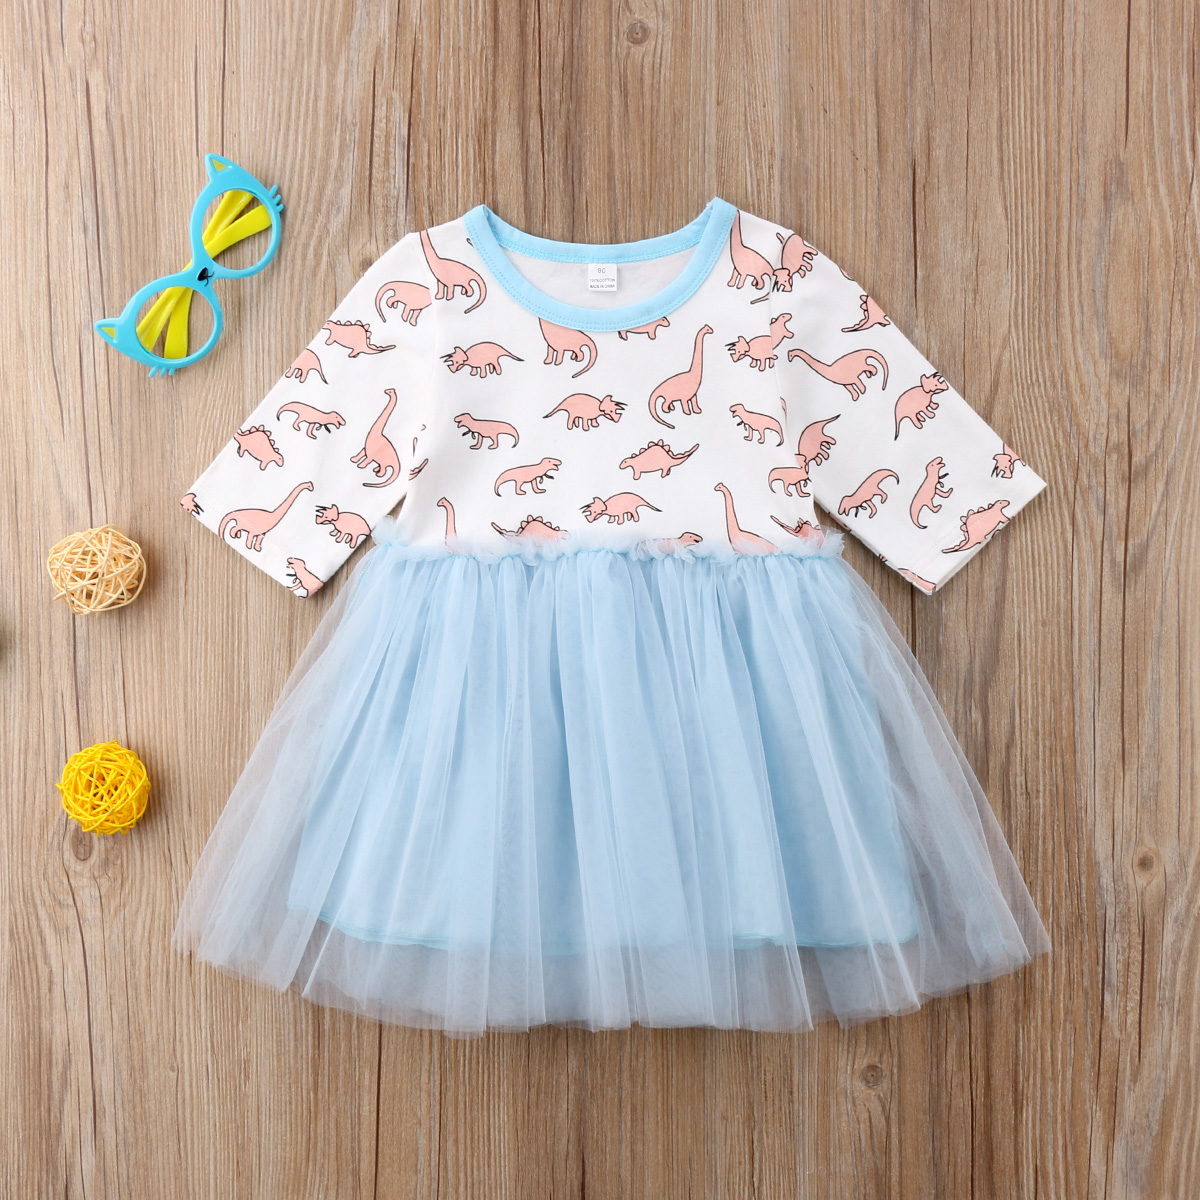 2018 Leuke Peuter Kids Baby Meisje Dinosaurus Blauw Patchwork Tulle Mesh Jurk Lange Mouw Jurk Kleding Yu